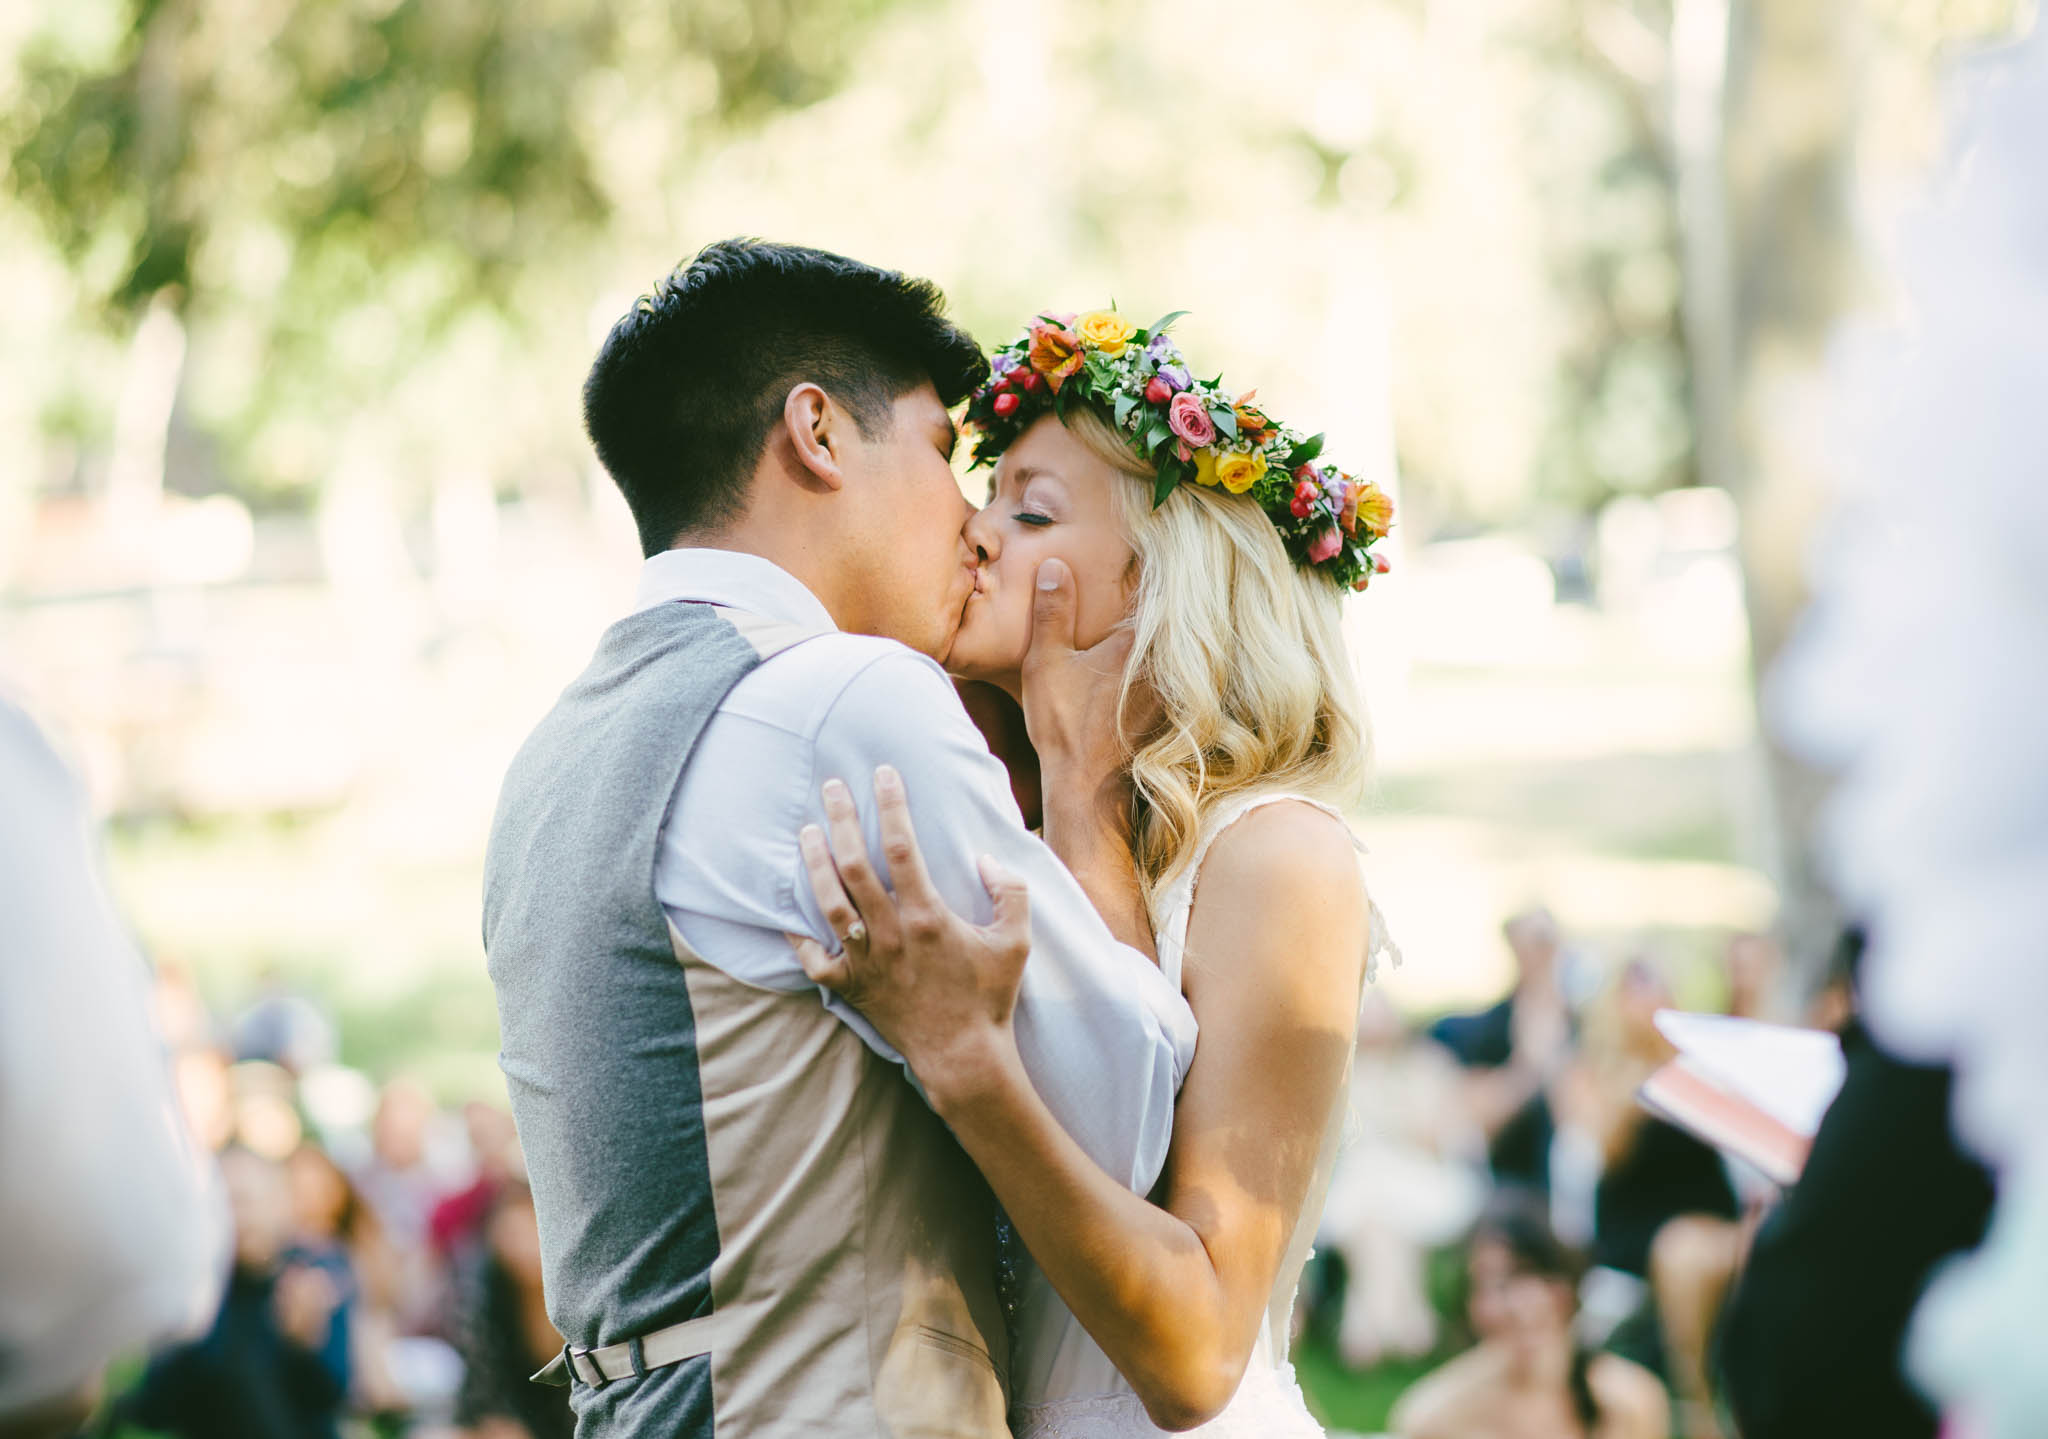 ©Isaiah & Taylor Photography - Los Angeles Wedding Photographer - Mexican Bohemian Wedding, Laguna Niguel Regional Park, Orange County-33.jpg